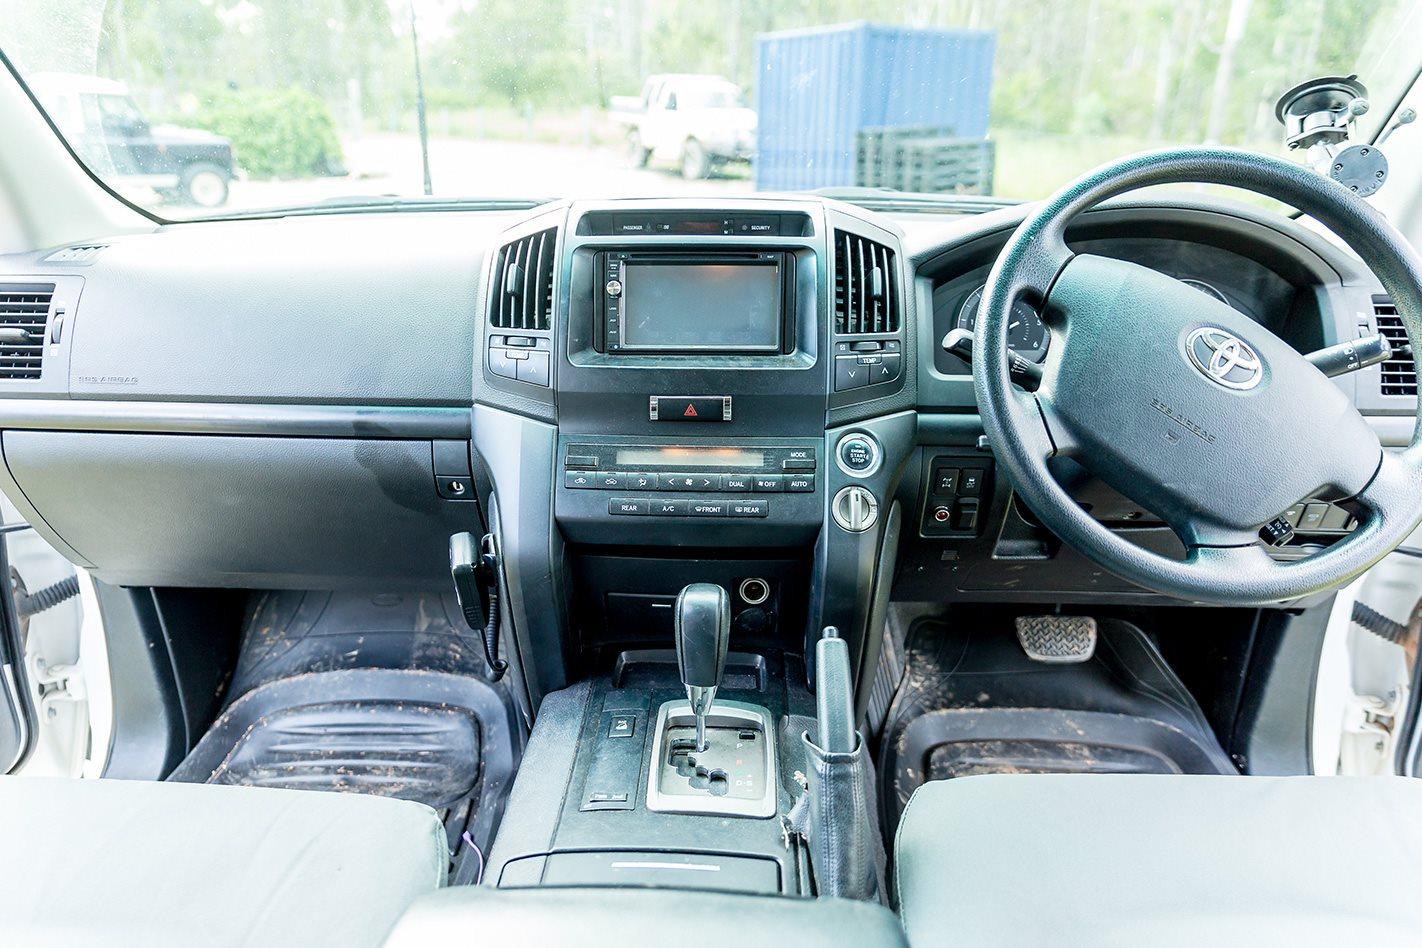 Custom Land Cruiser 200 Series interior